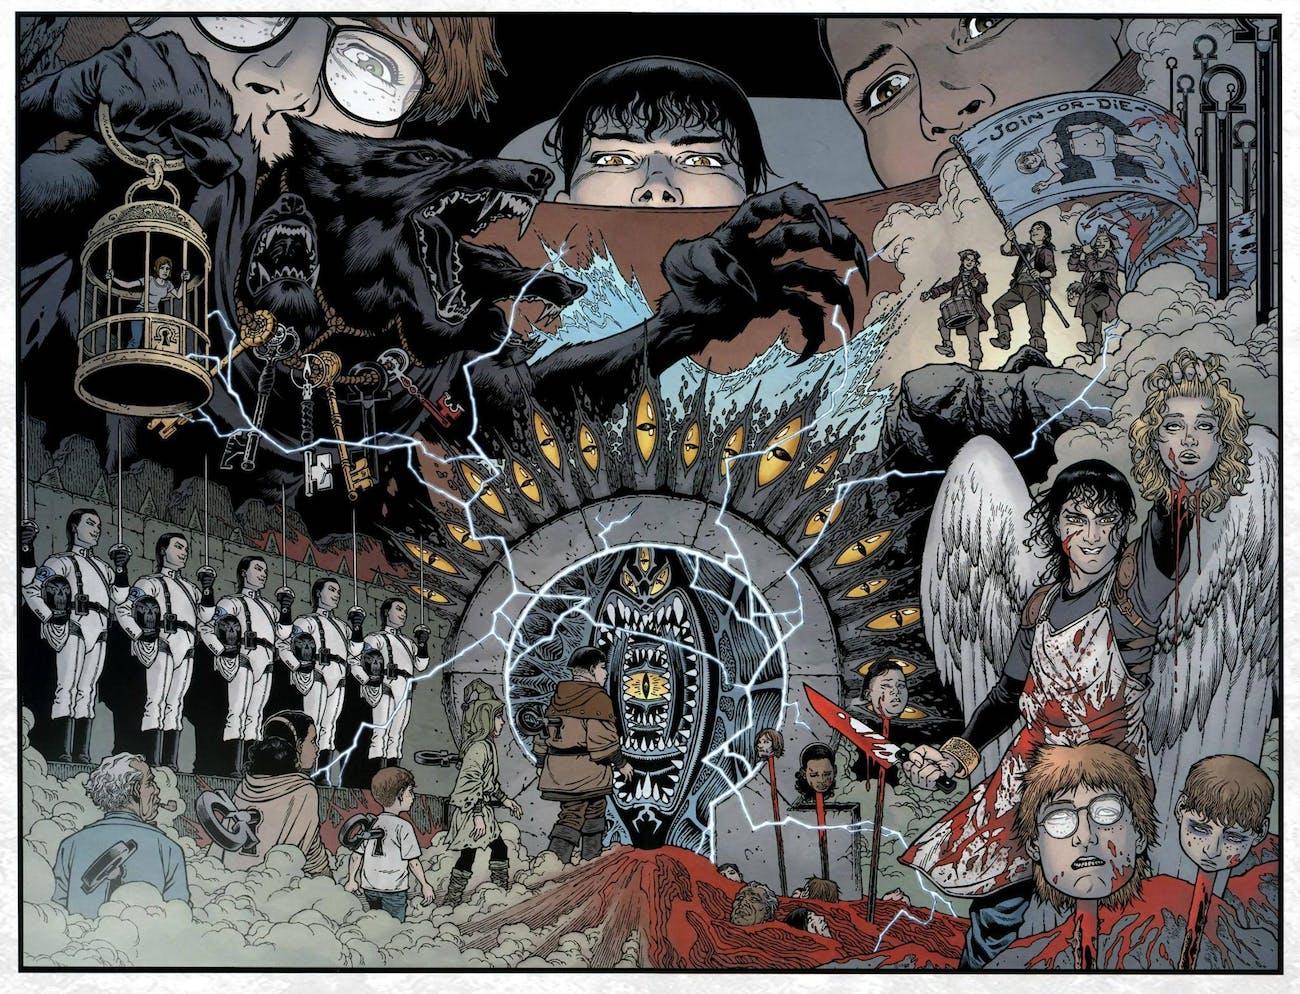 'Locke & Key' sounds like pretty fun fantasy, but it's moreso gruesome, Lovecraftian horror.